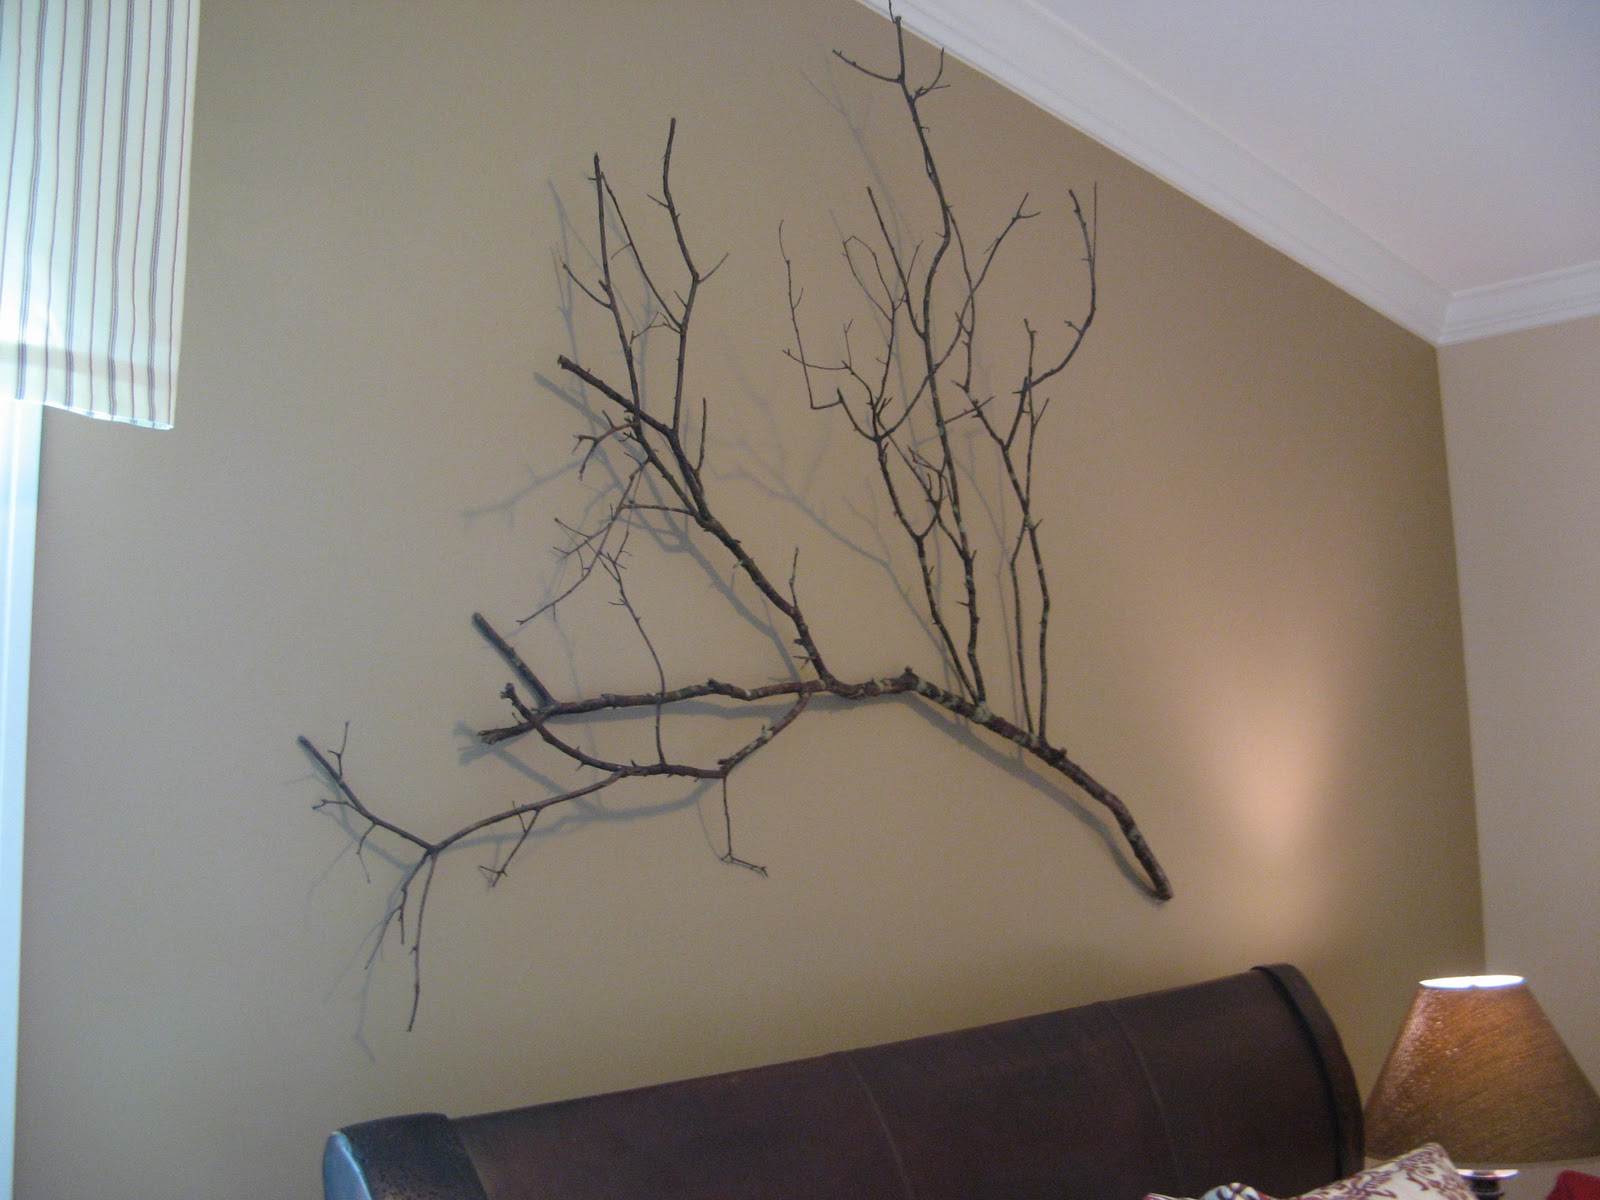 Susan Snyder: TREE BRANCH WALL ART